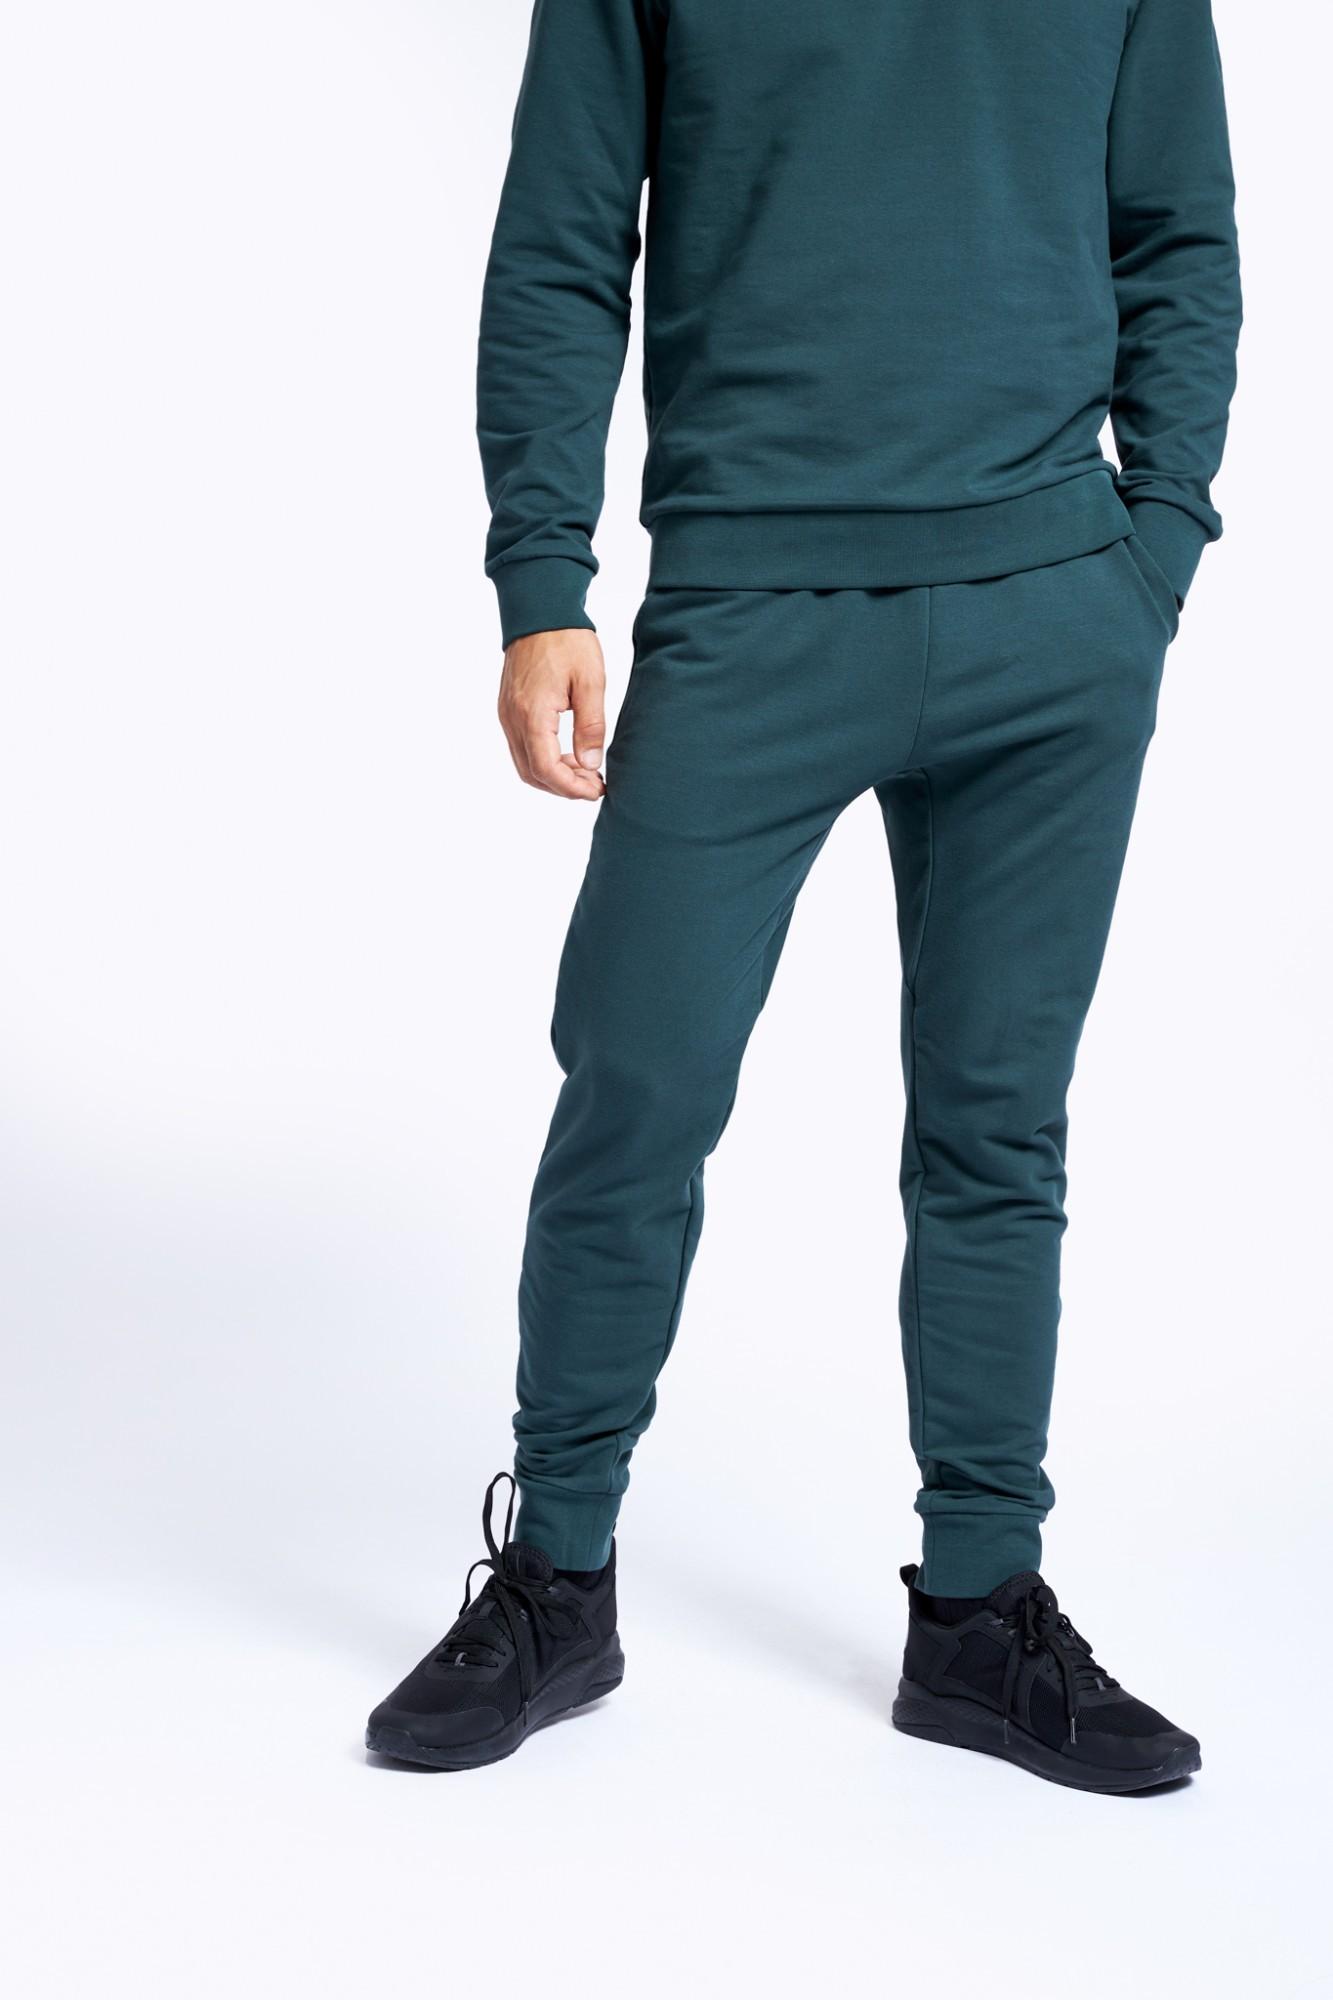 AUDIMAS Priglud. tamprios medviln. kelnės 2021-469 Green Gables 176/M